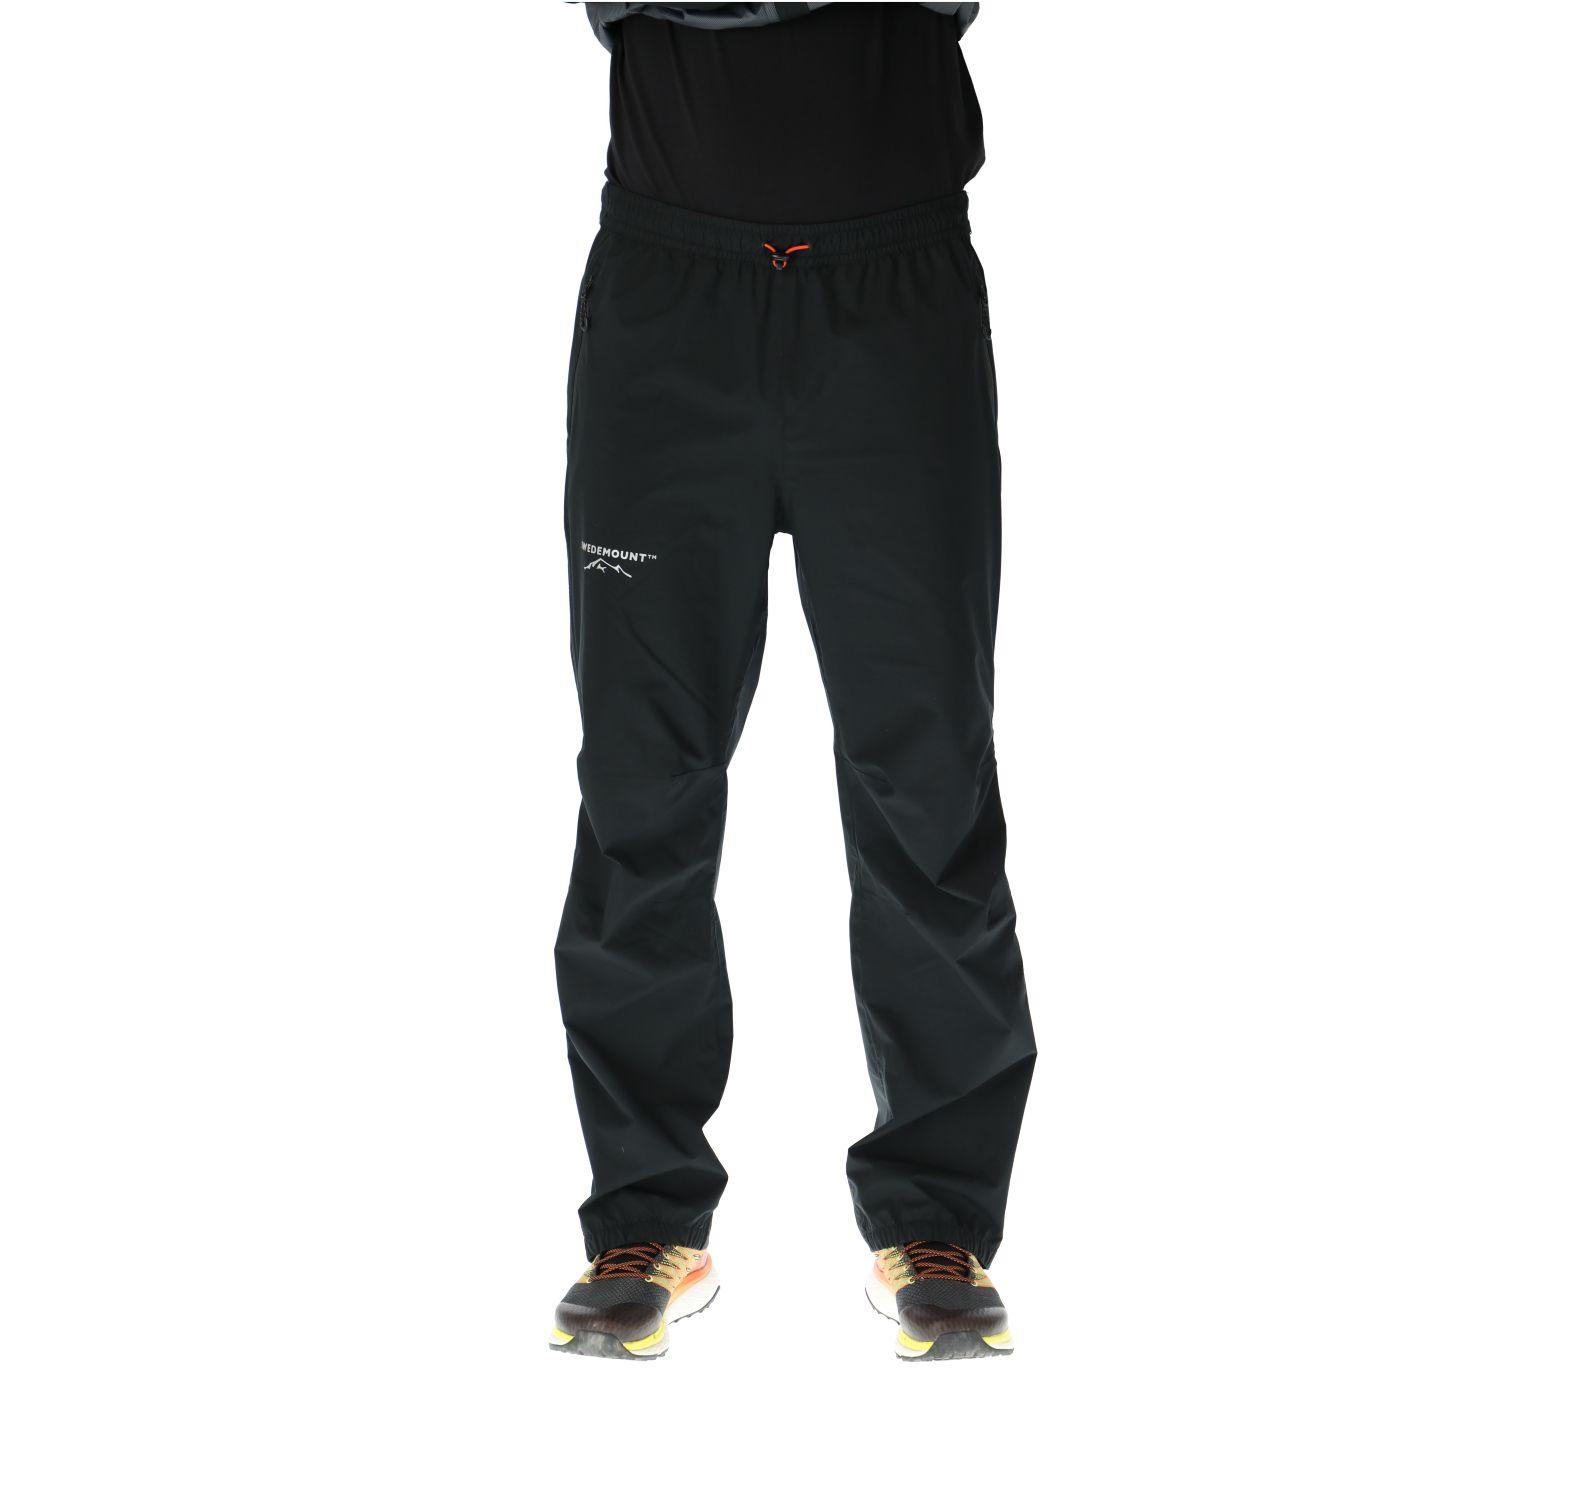 Multi Layer Stretch Rain Pants, Black, L,  Swedemount